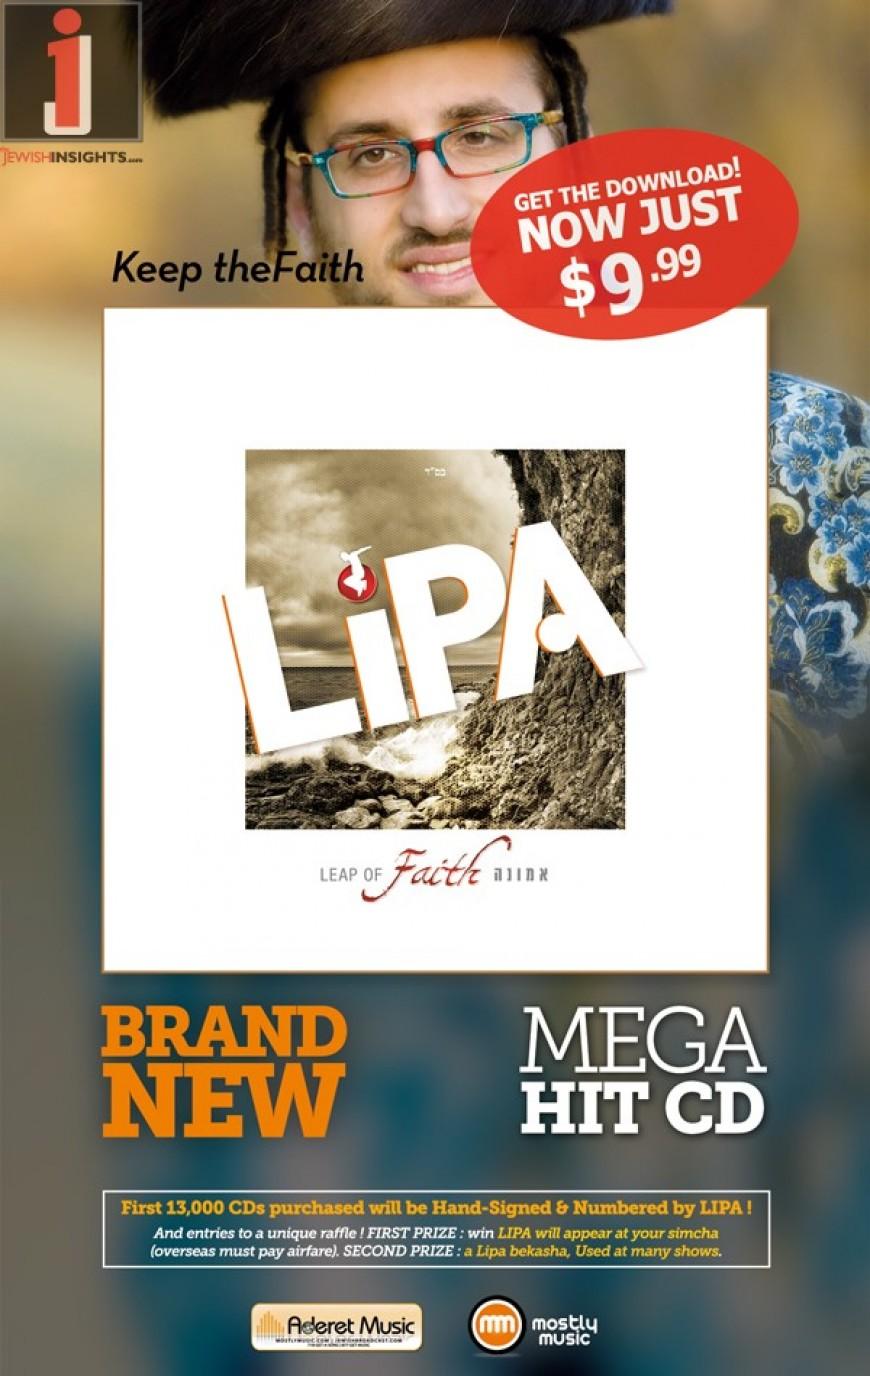 Take The Leap of Faith + Audio Sampler + All New Lipa Website